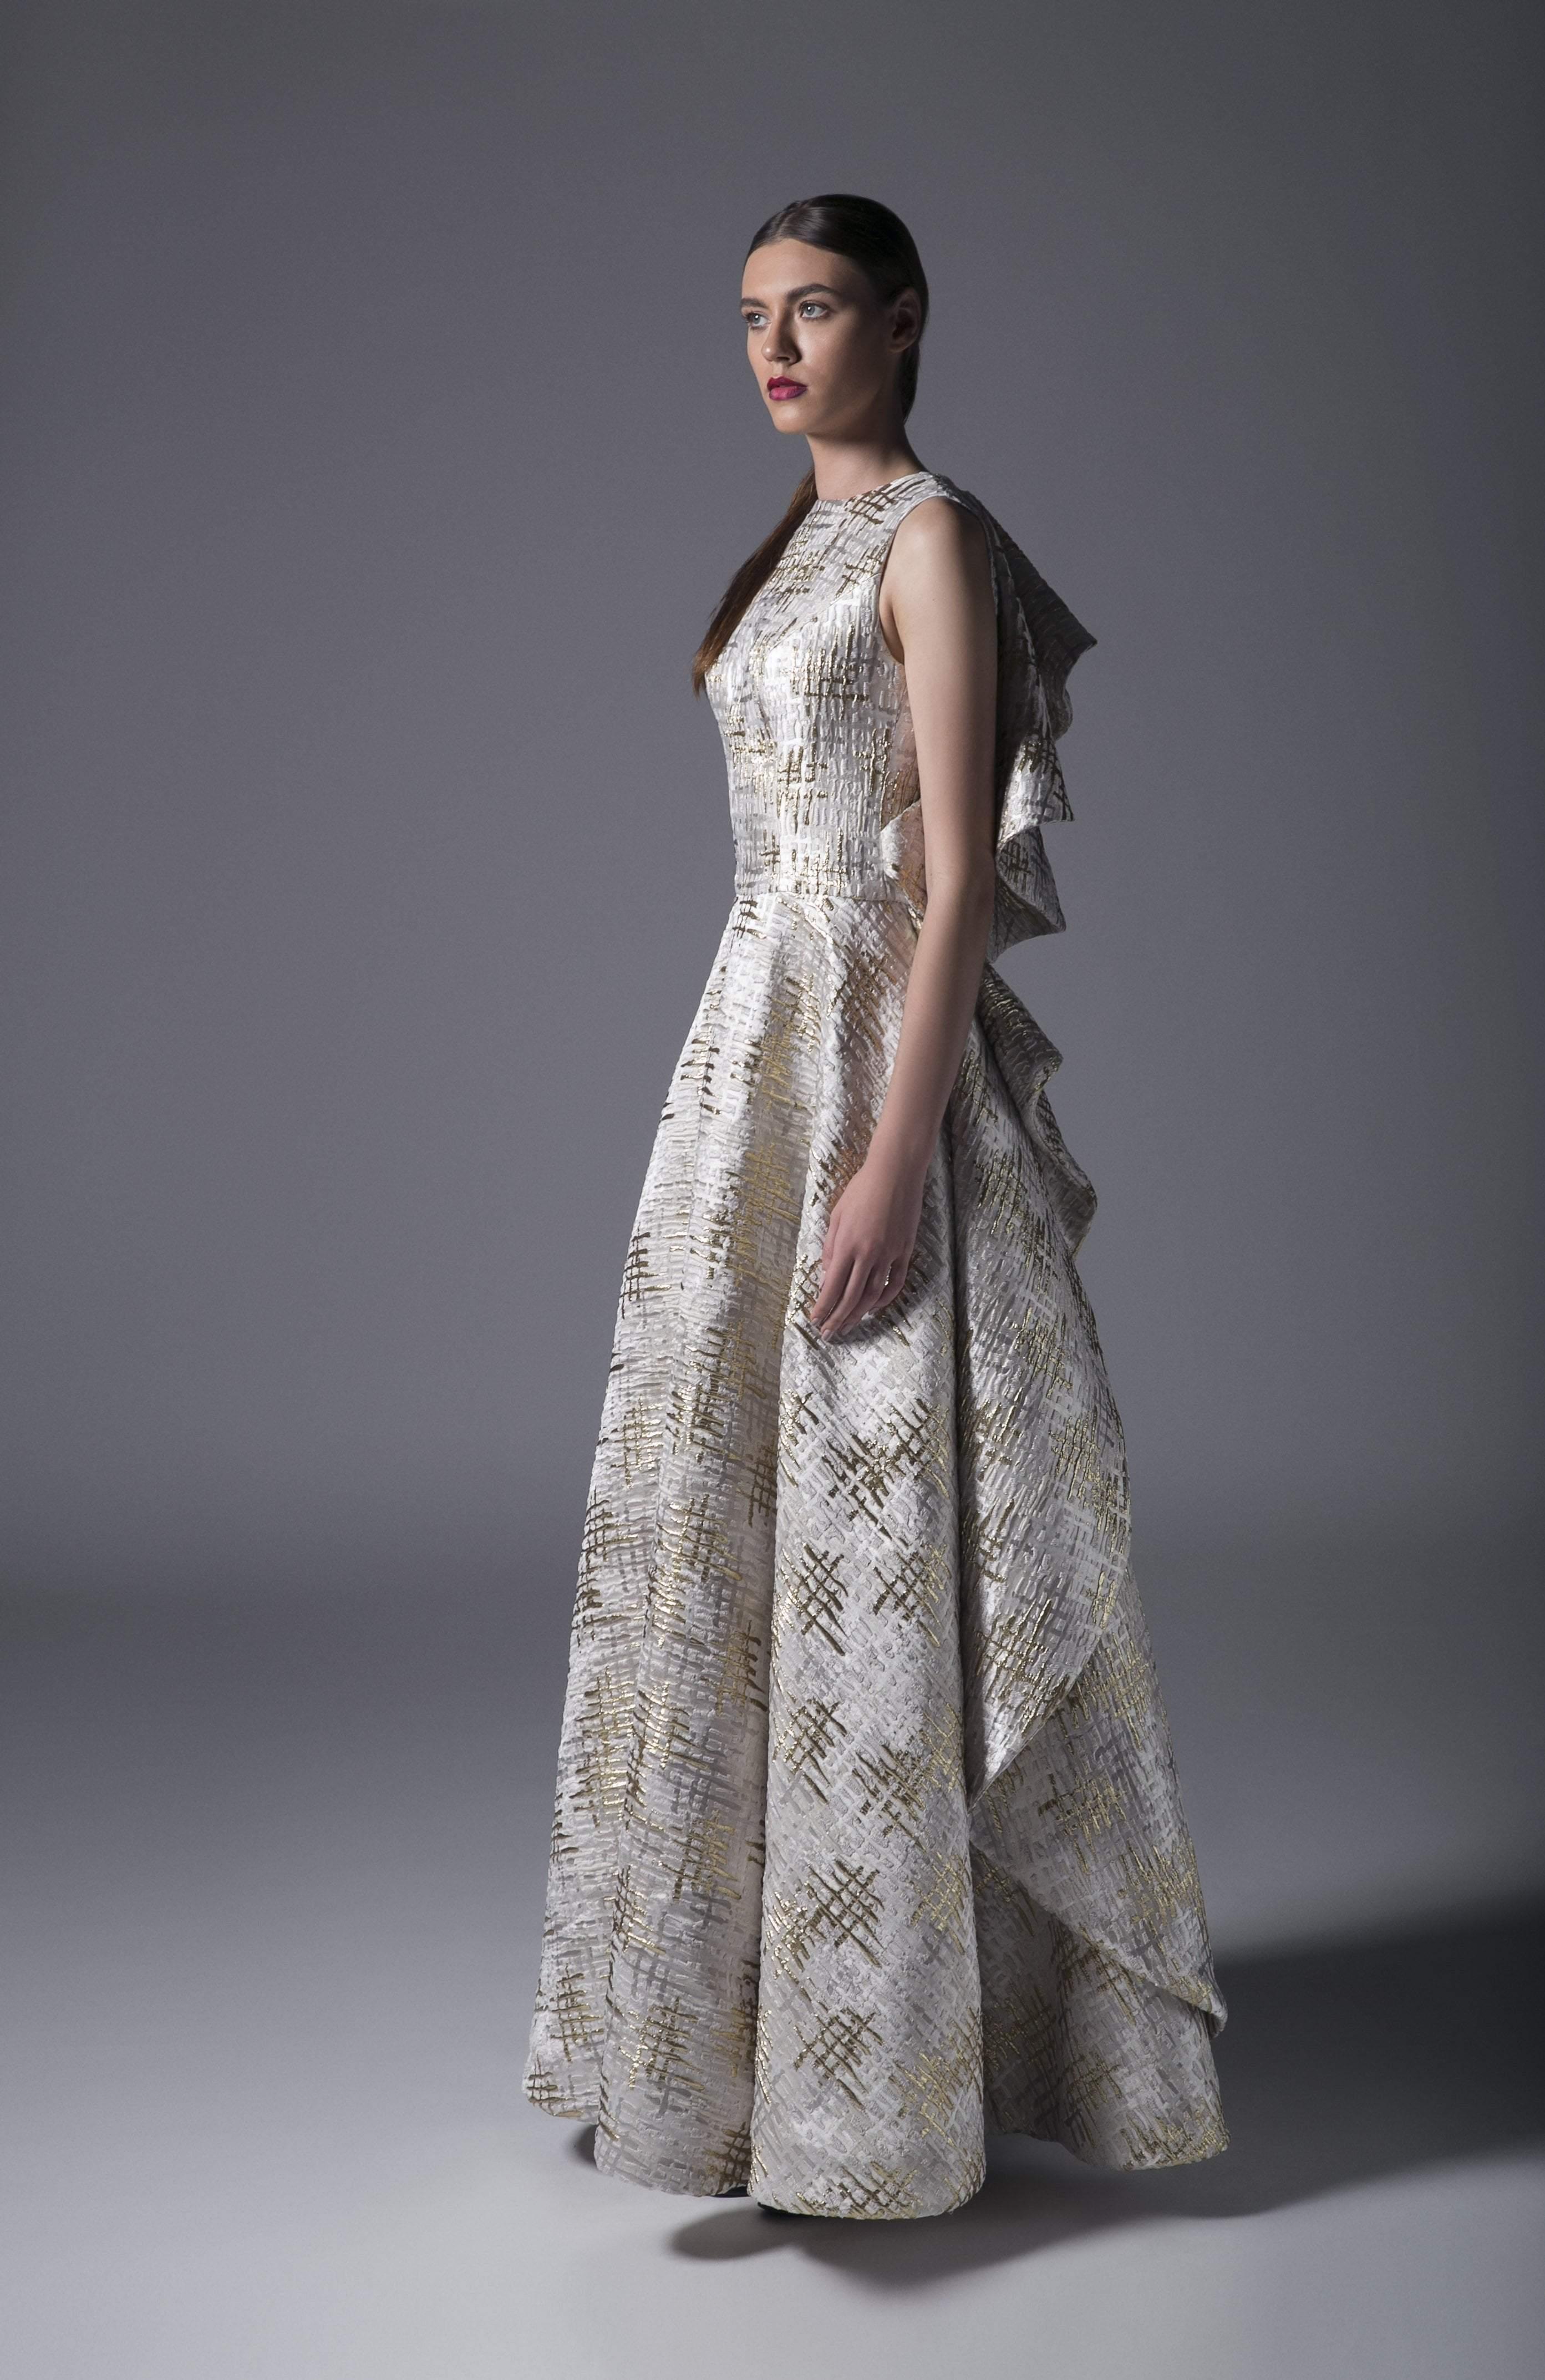 Edward Arsouni Couture - 370 Metallic Ruffled Gown In Ecru Gold